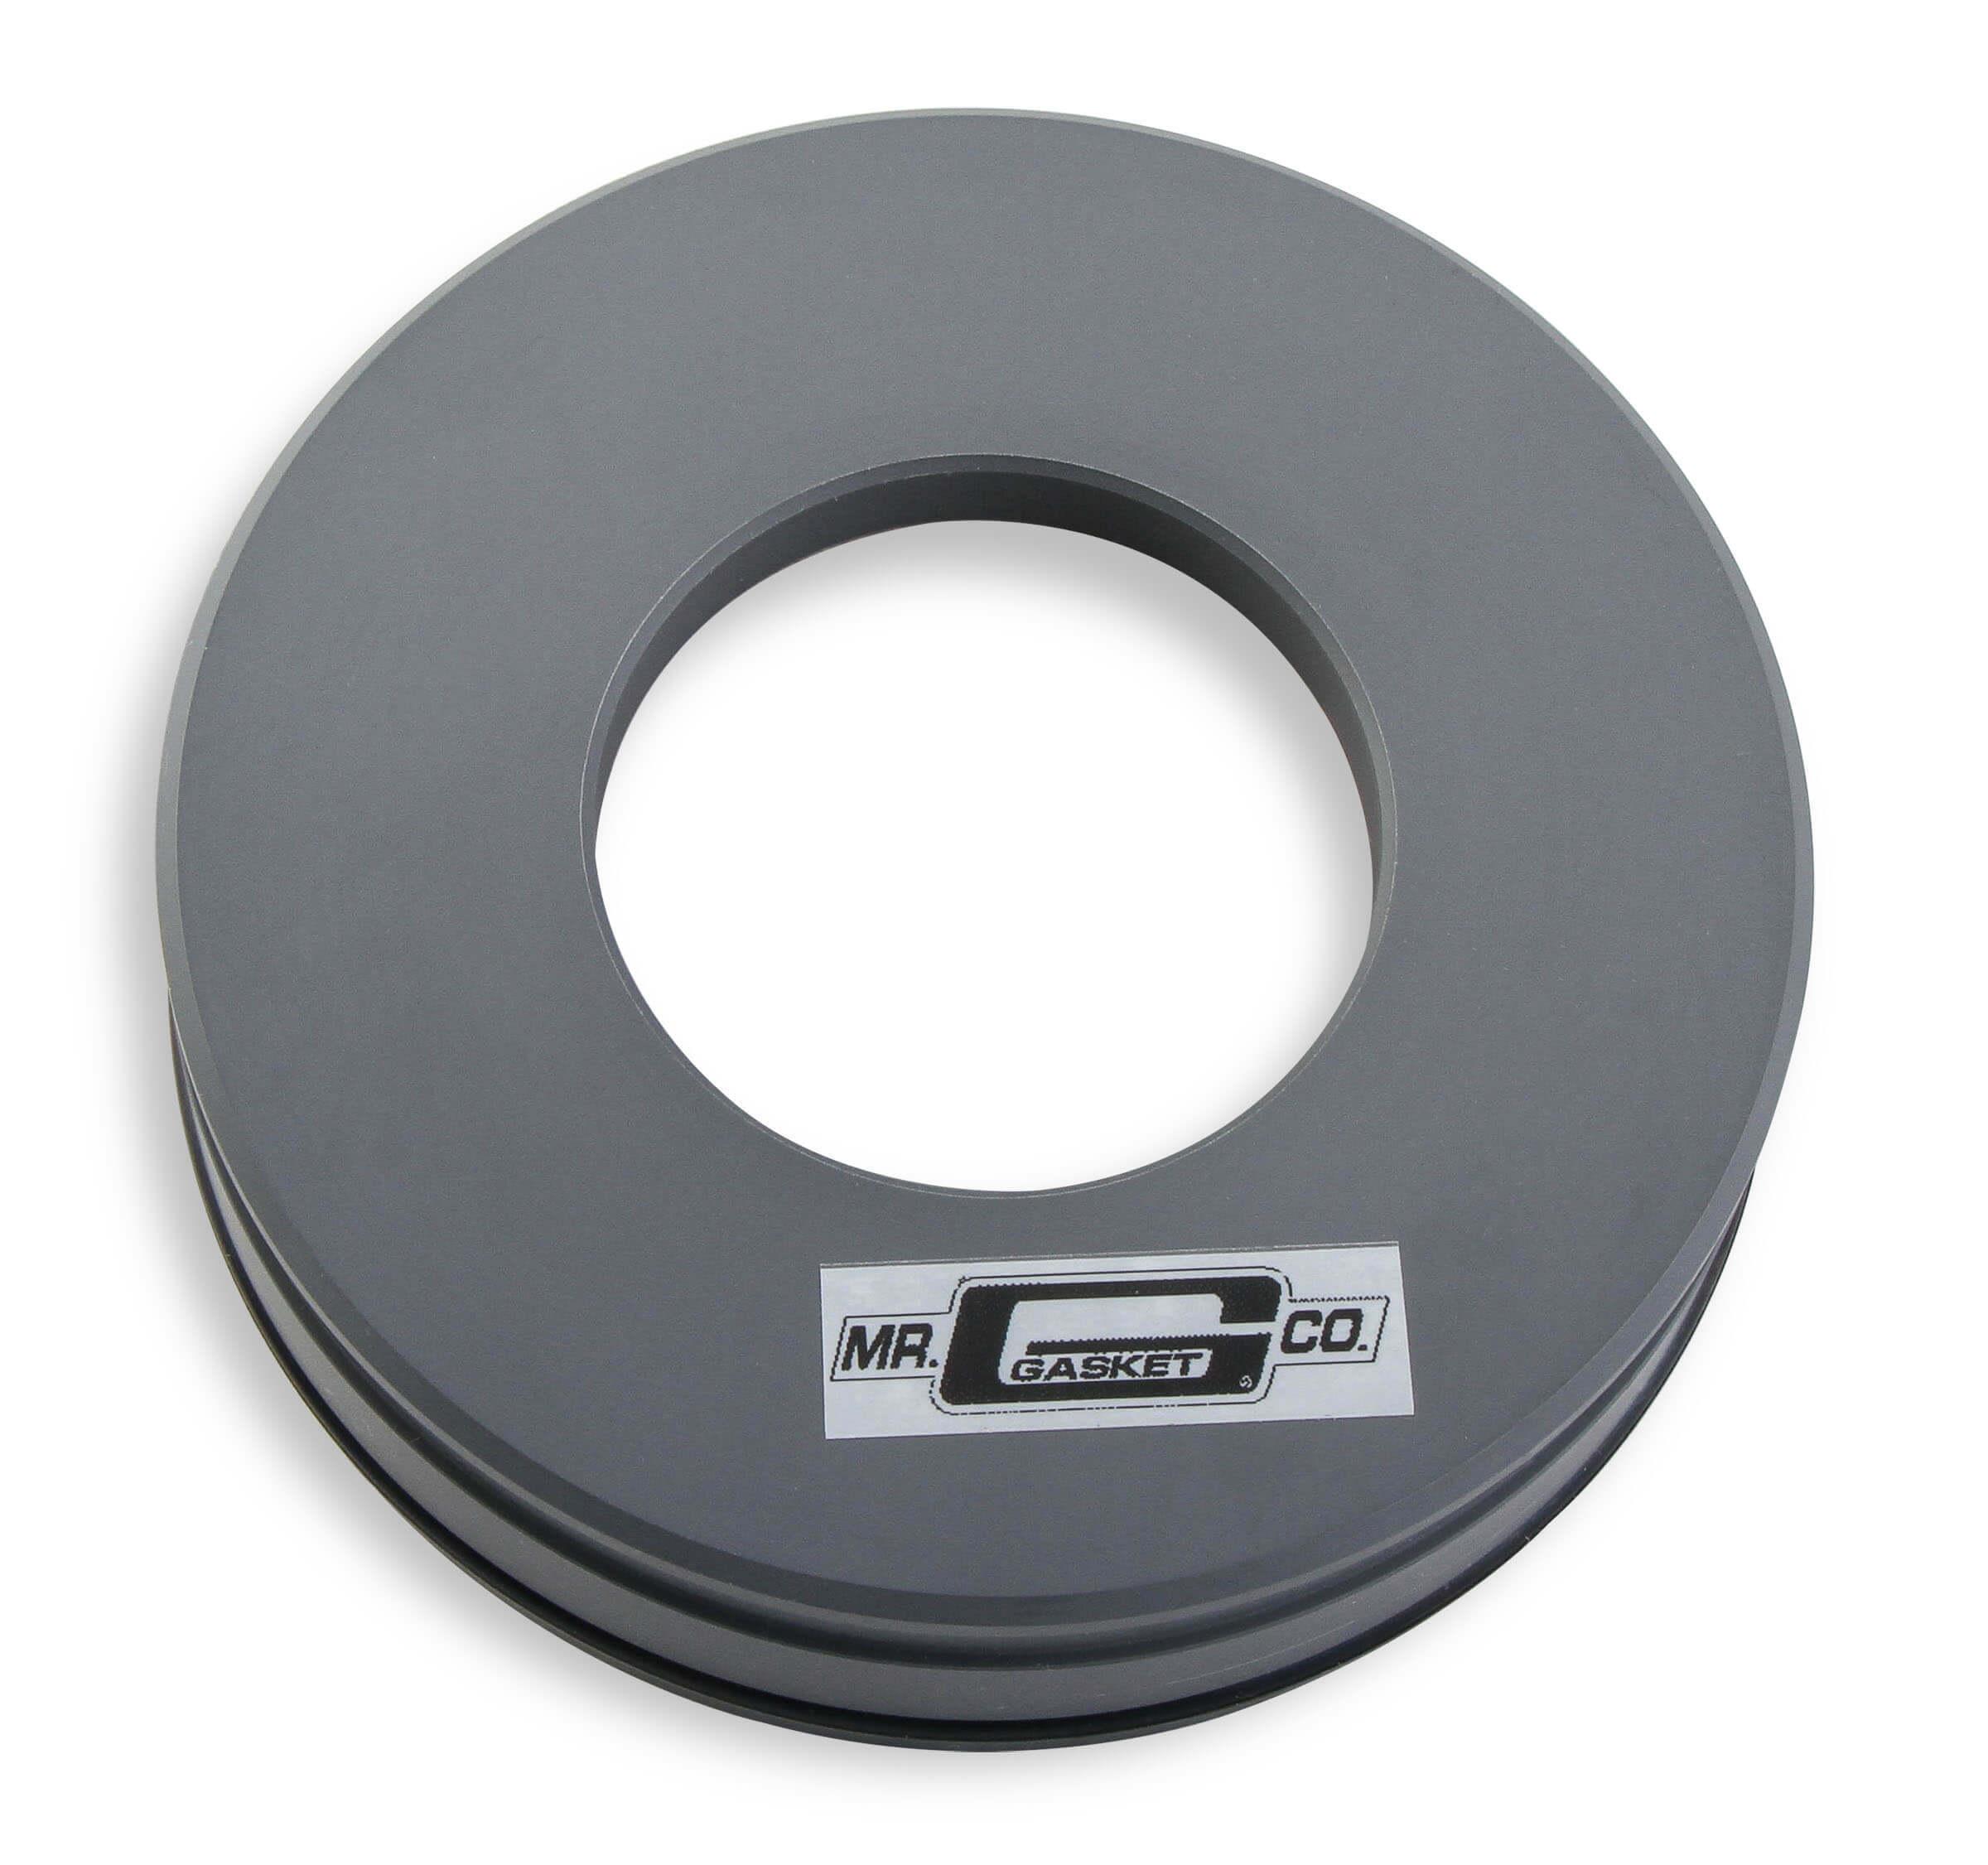 Mr. Gasket Alignment Tool - GM LS Rear Block Cover